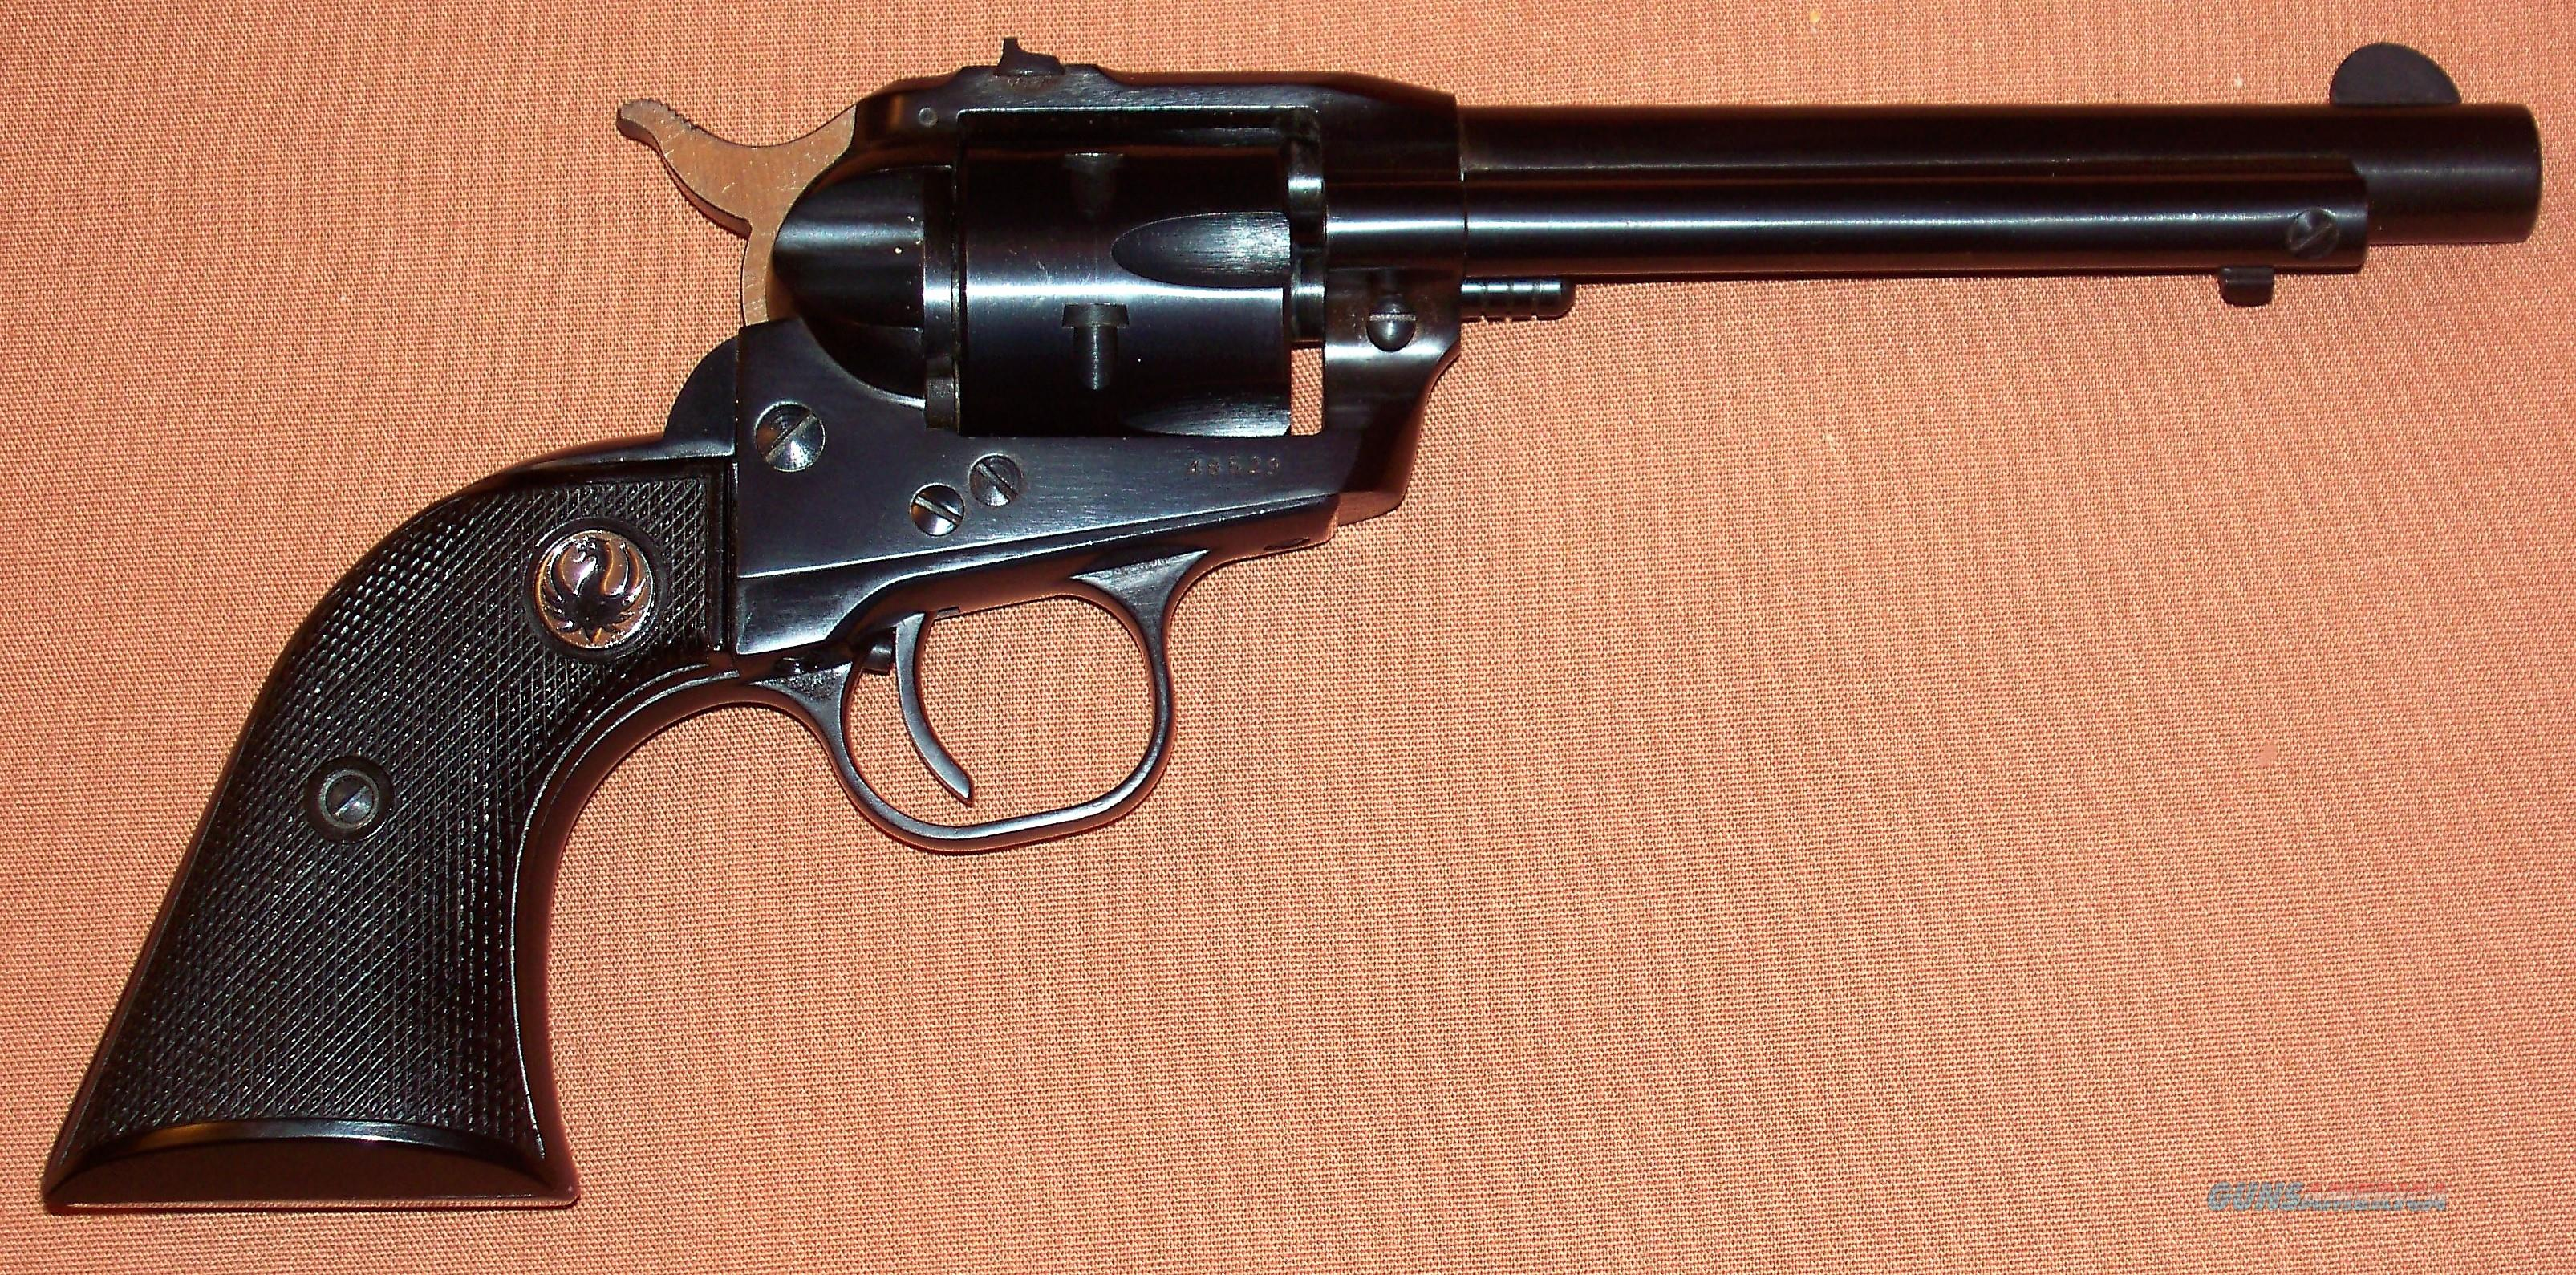 Ruger Single Six Flat Loading Gate, .22LR c. 1956, N.I.B.   Guns > Pistols > Ruger Single Action Revolvers > Single Six Type